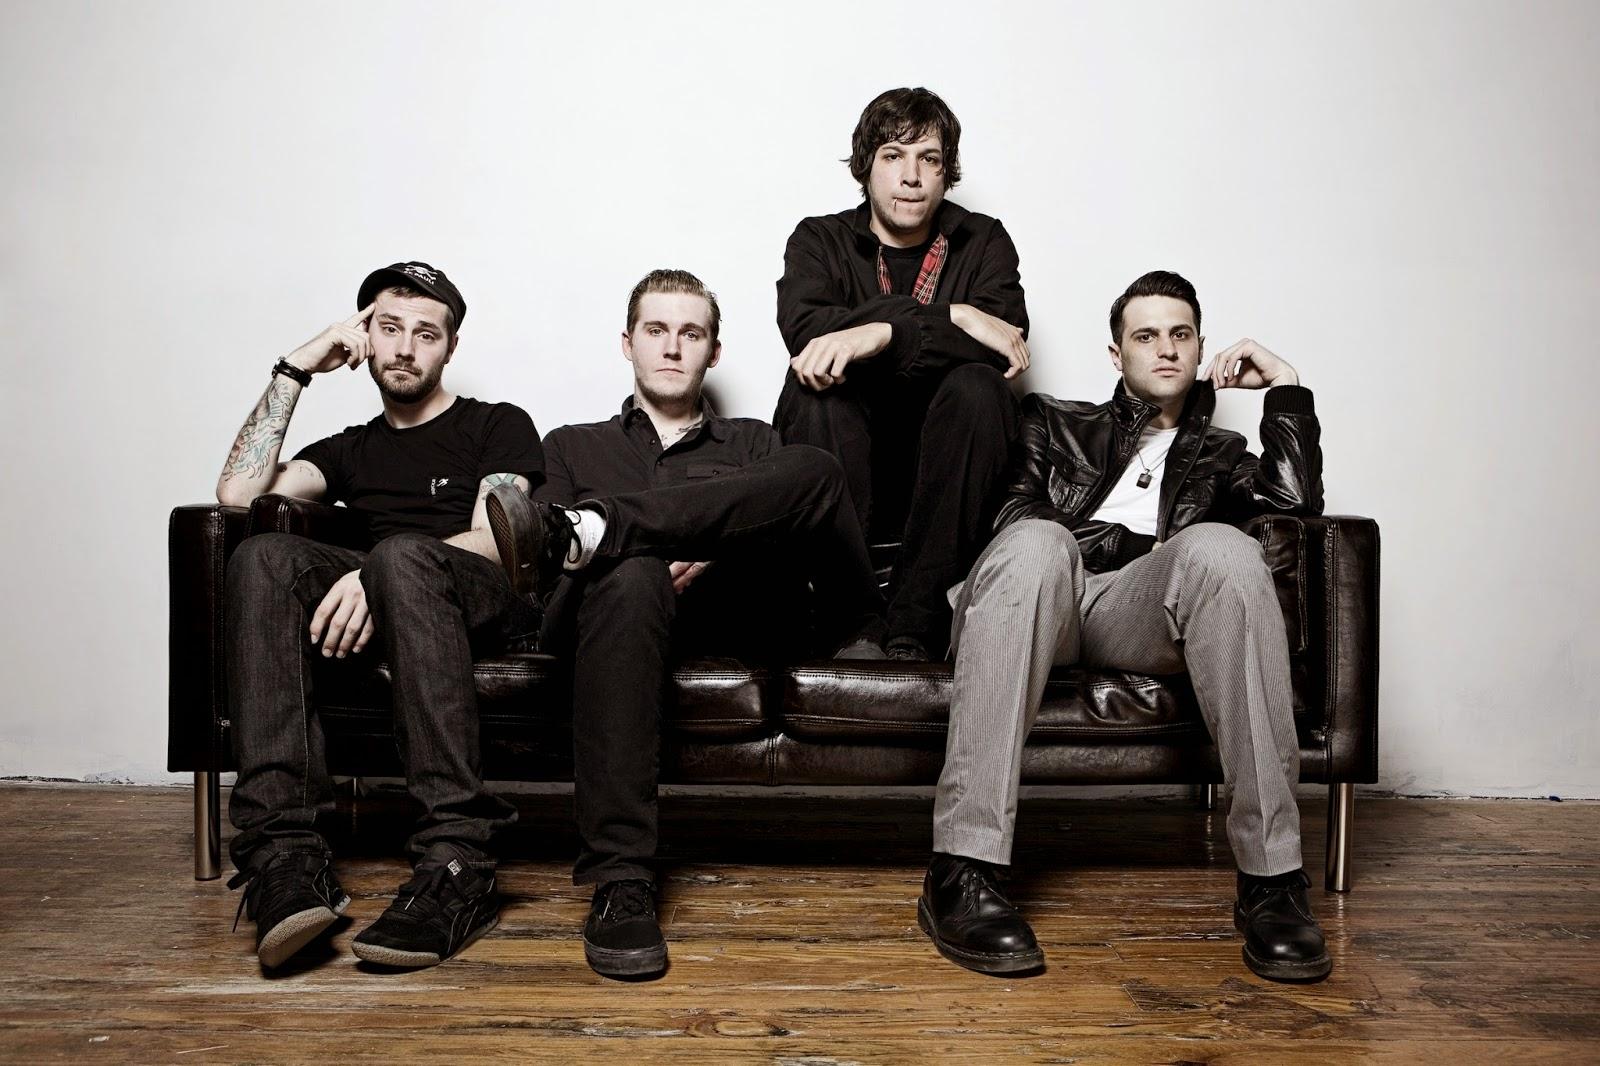 InThePunch: The Gaslight Anthem 2014 Tour